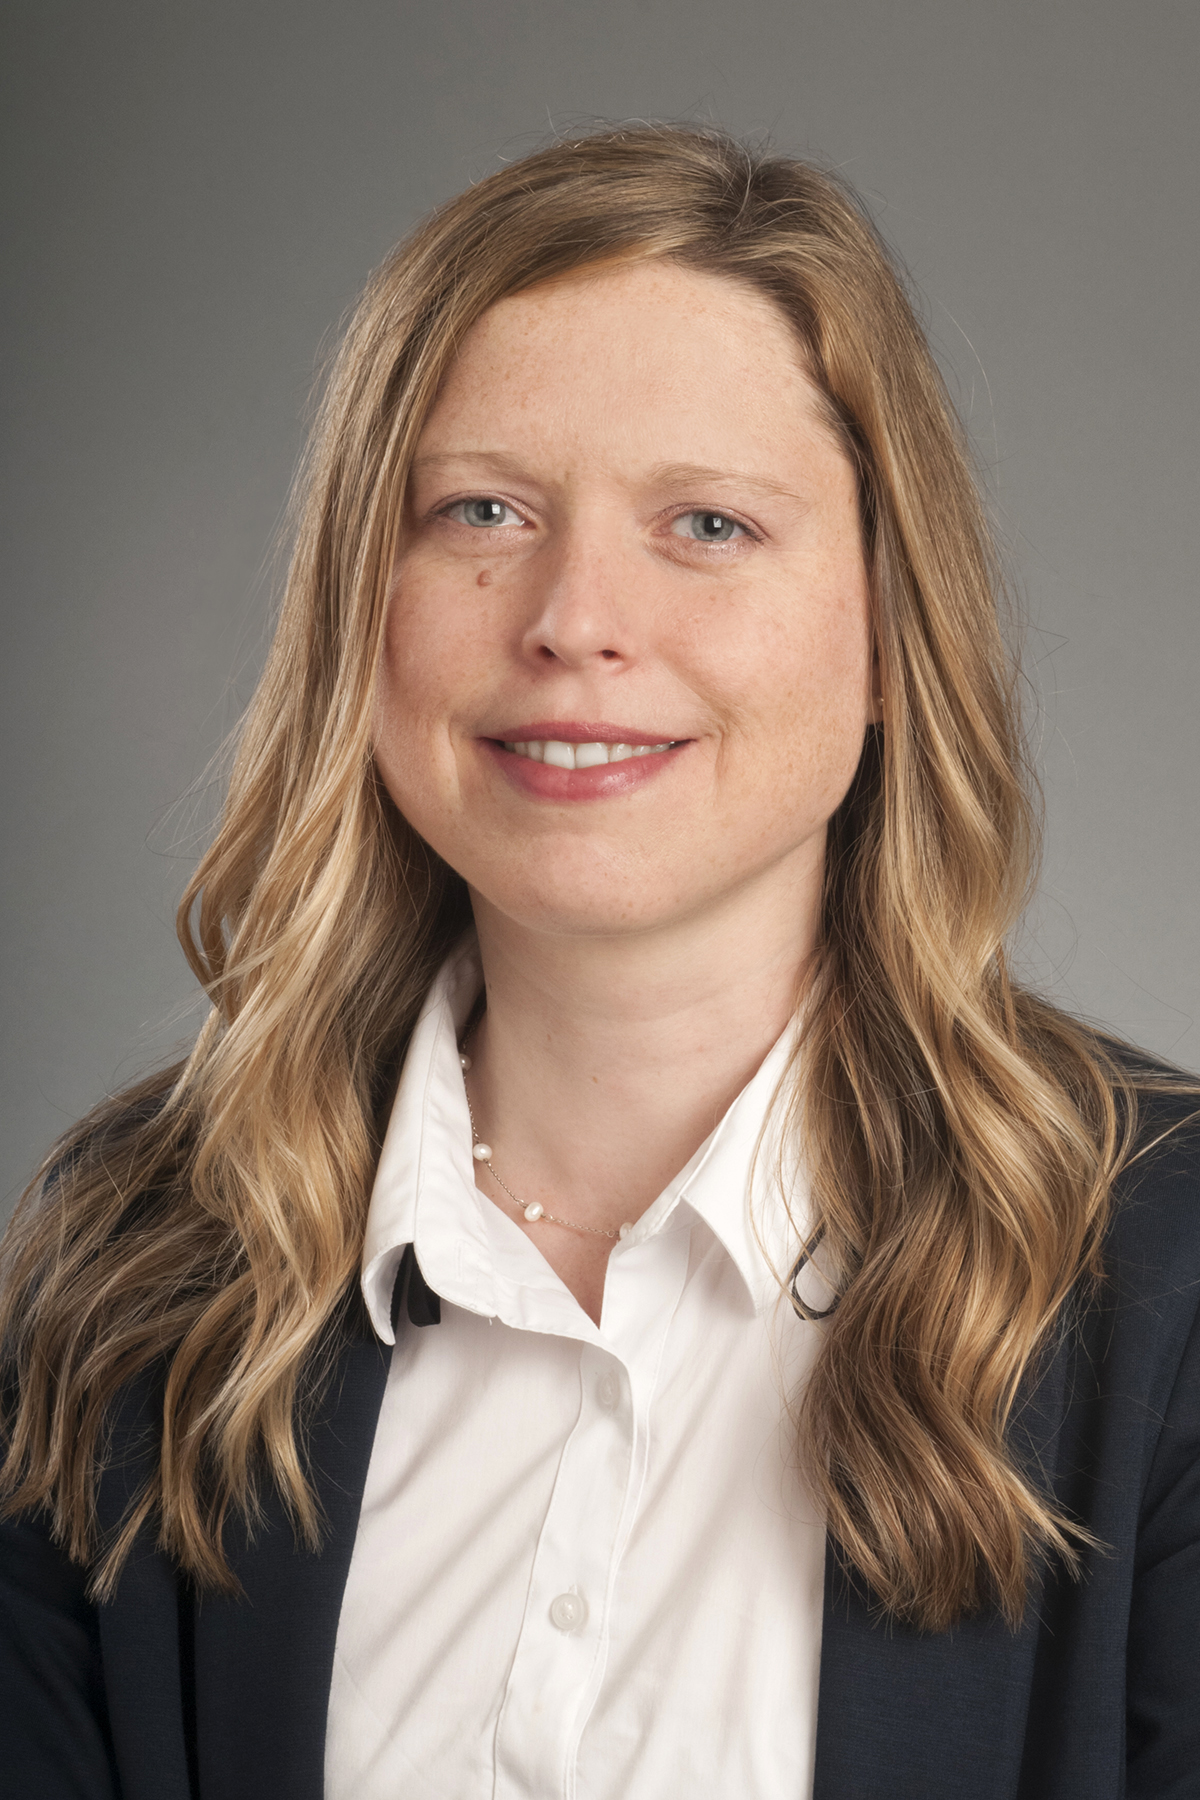 Portrait of Lisa Giacumo.